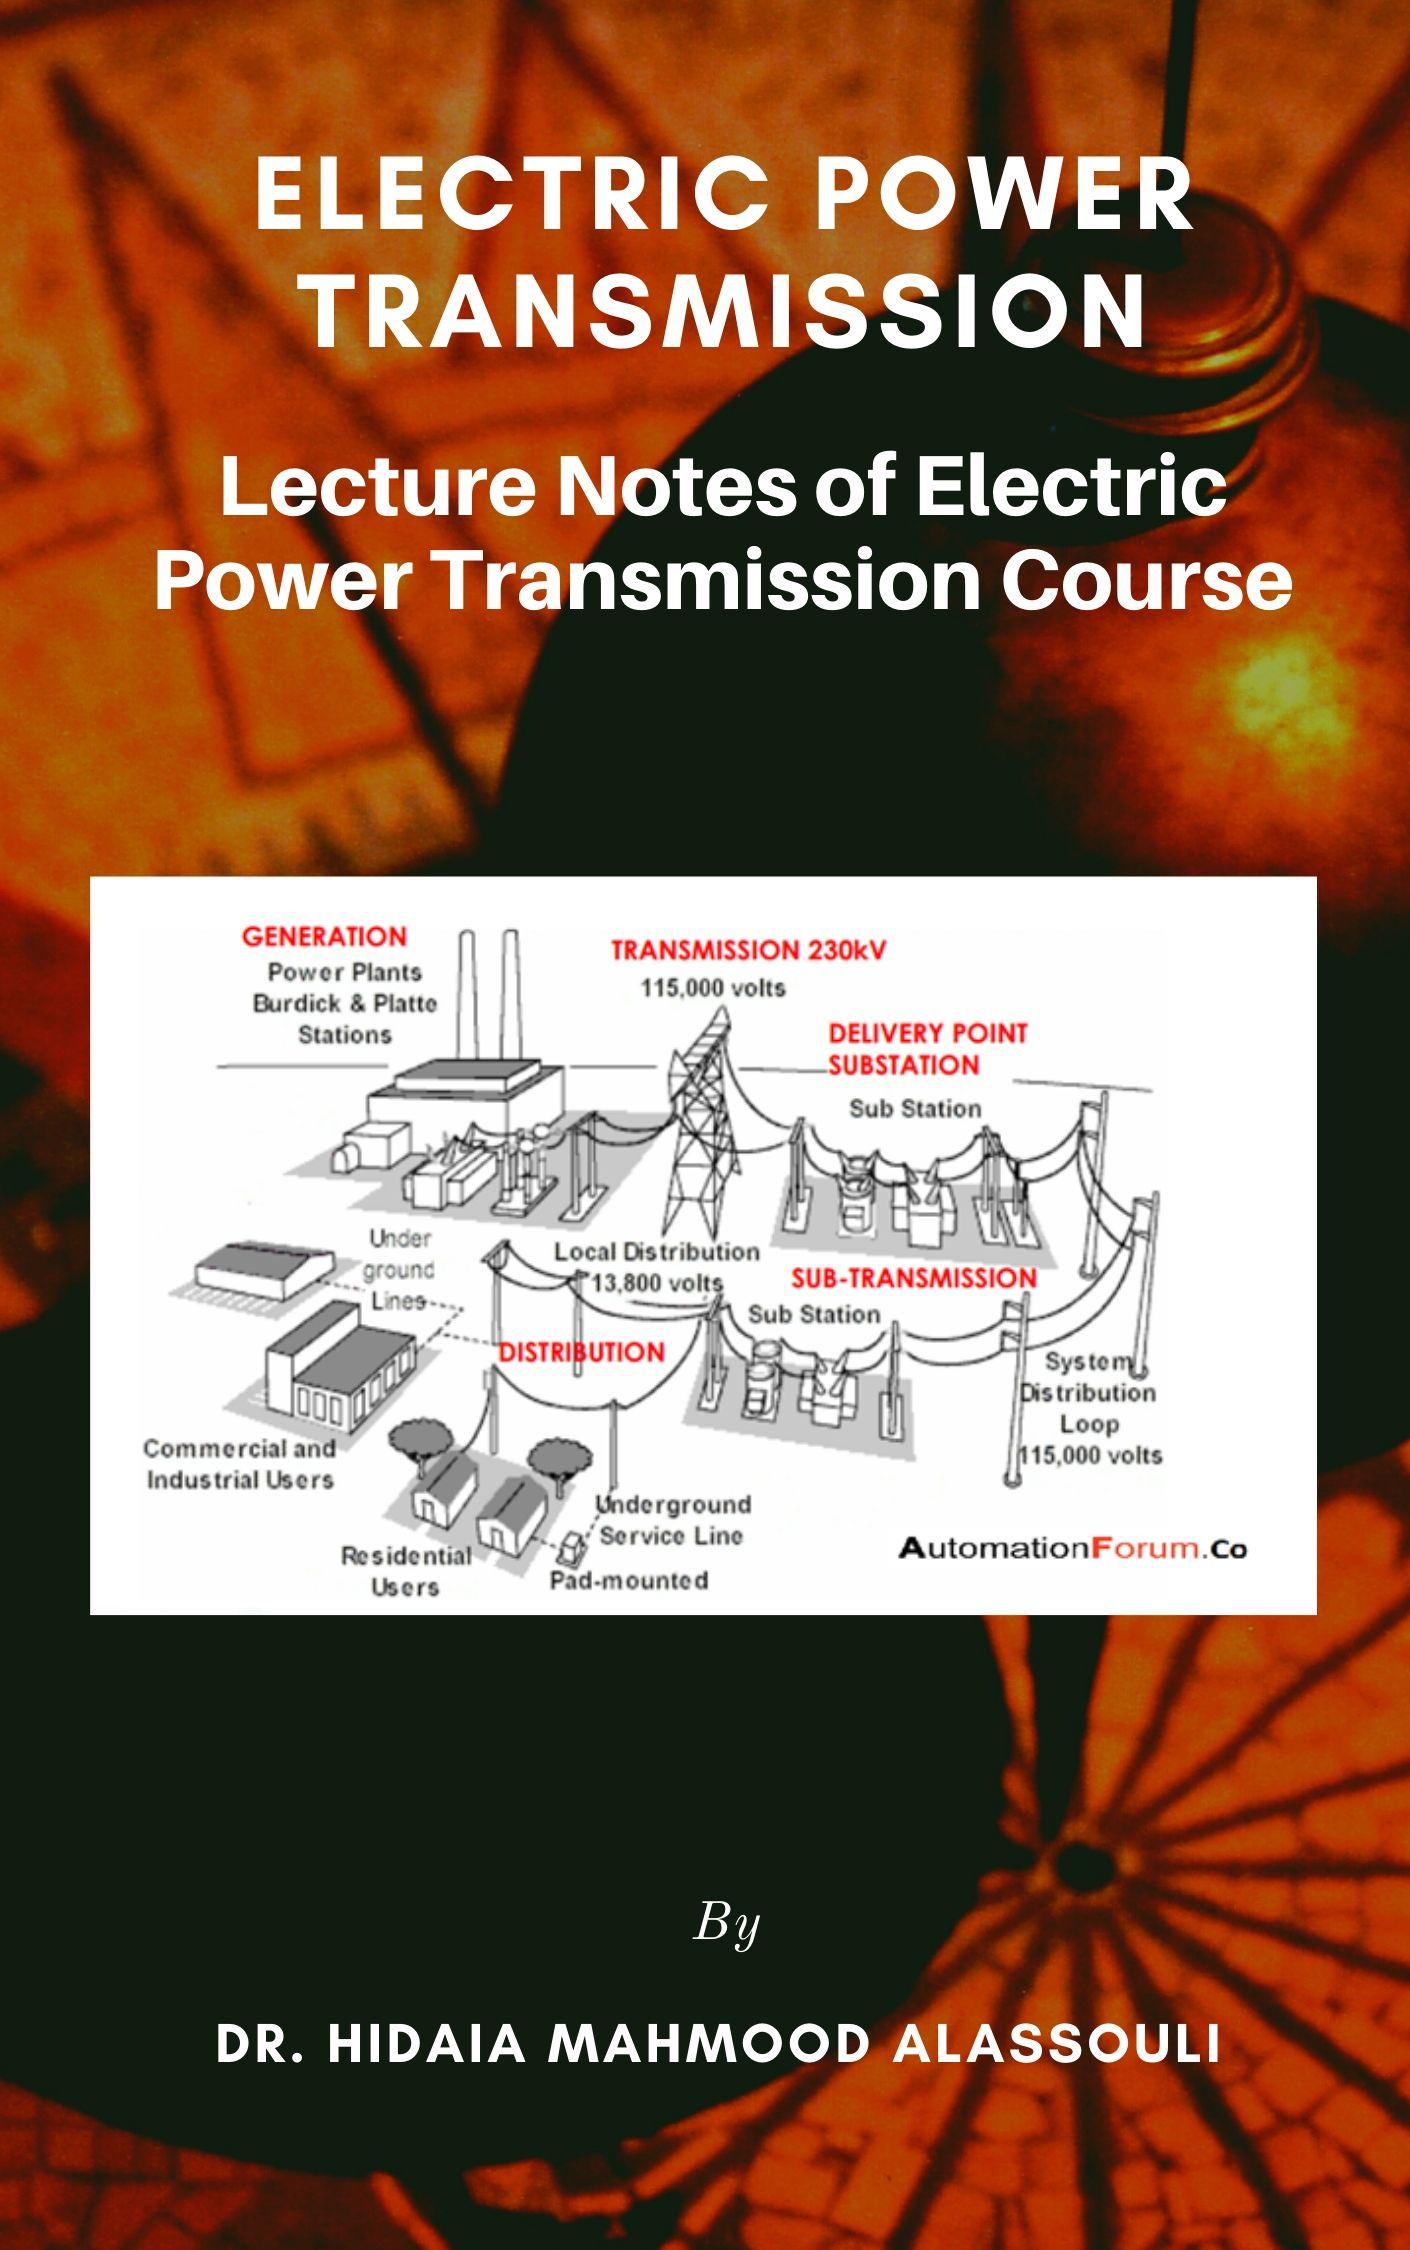 Electrical Power Transmission Ebook By Dr Hidaia Mahmood Alassouli Xinxii Gd Publishing Ltd Co Kg